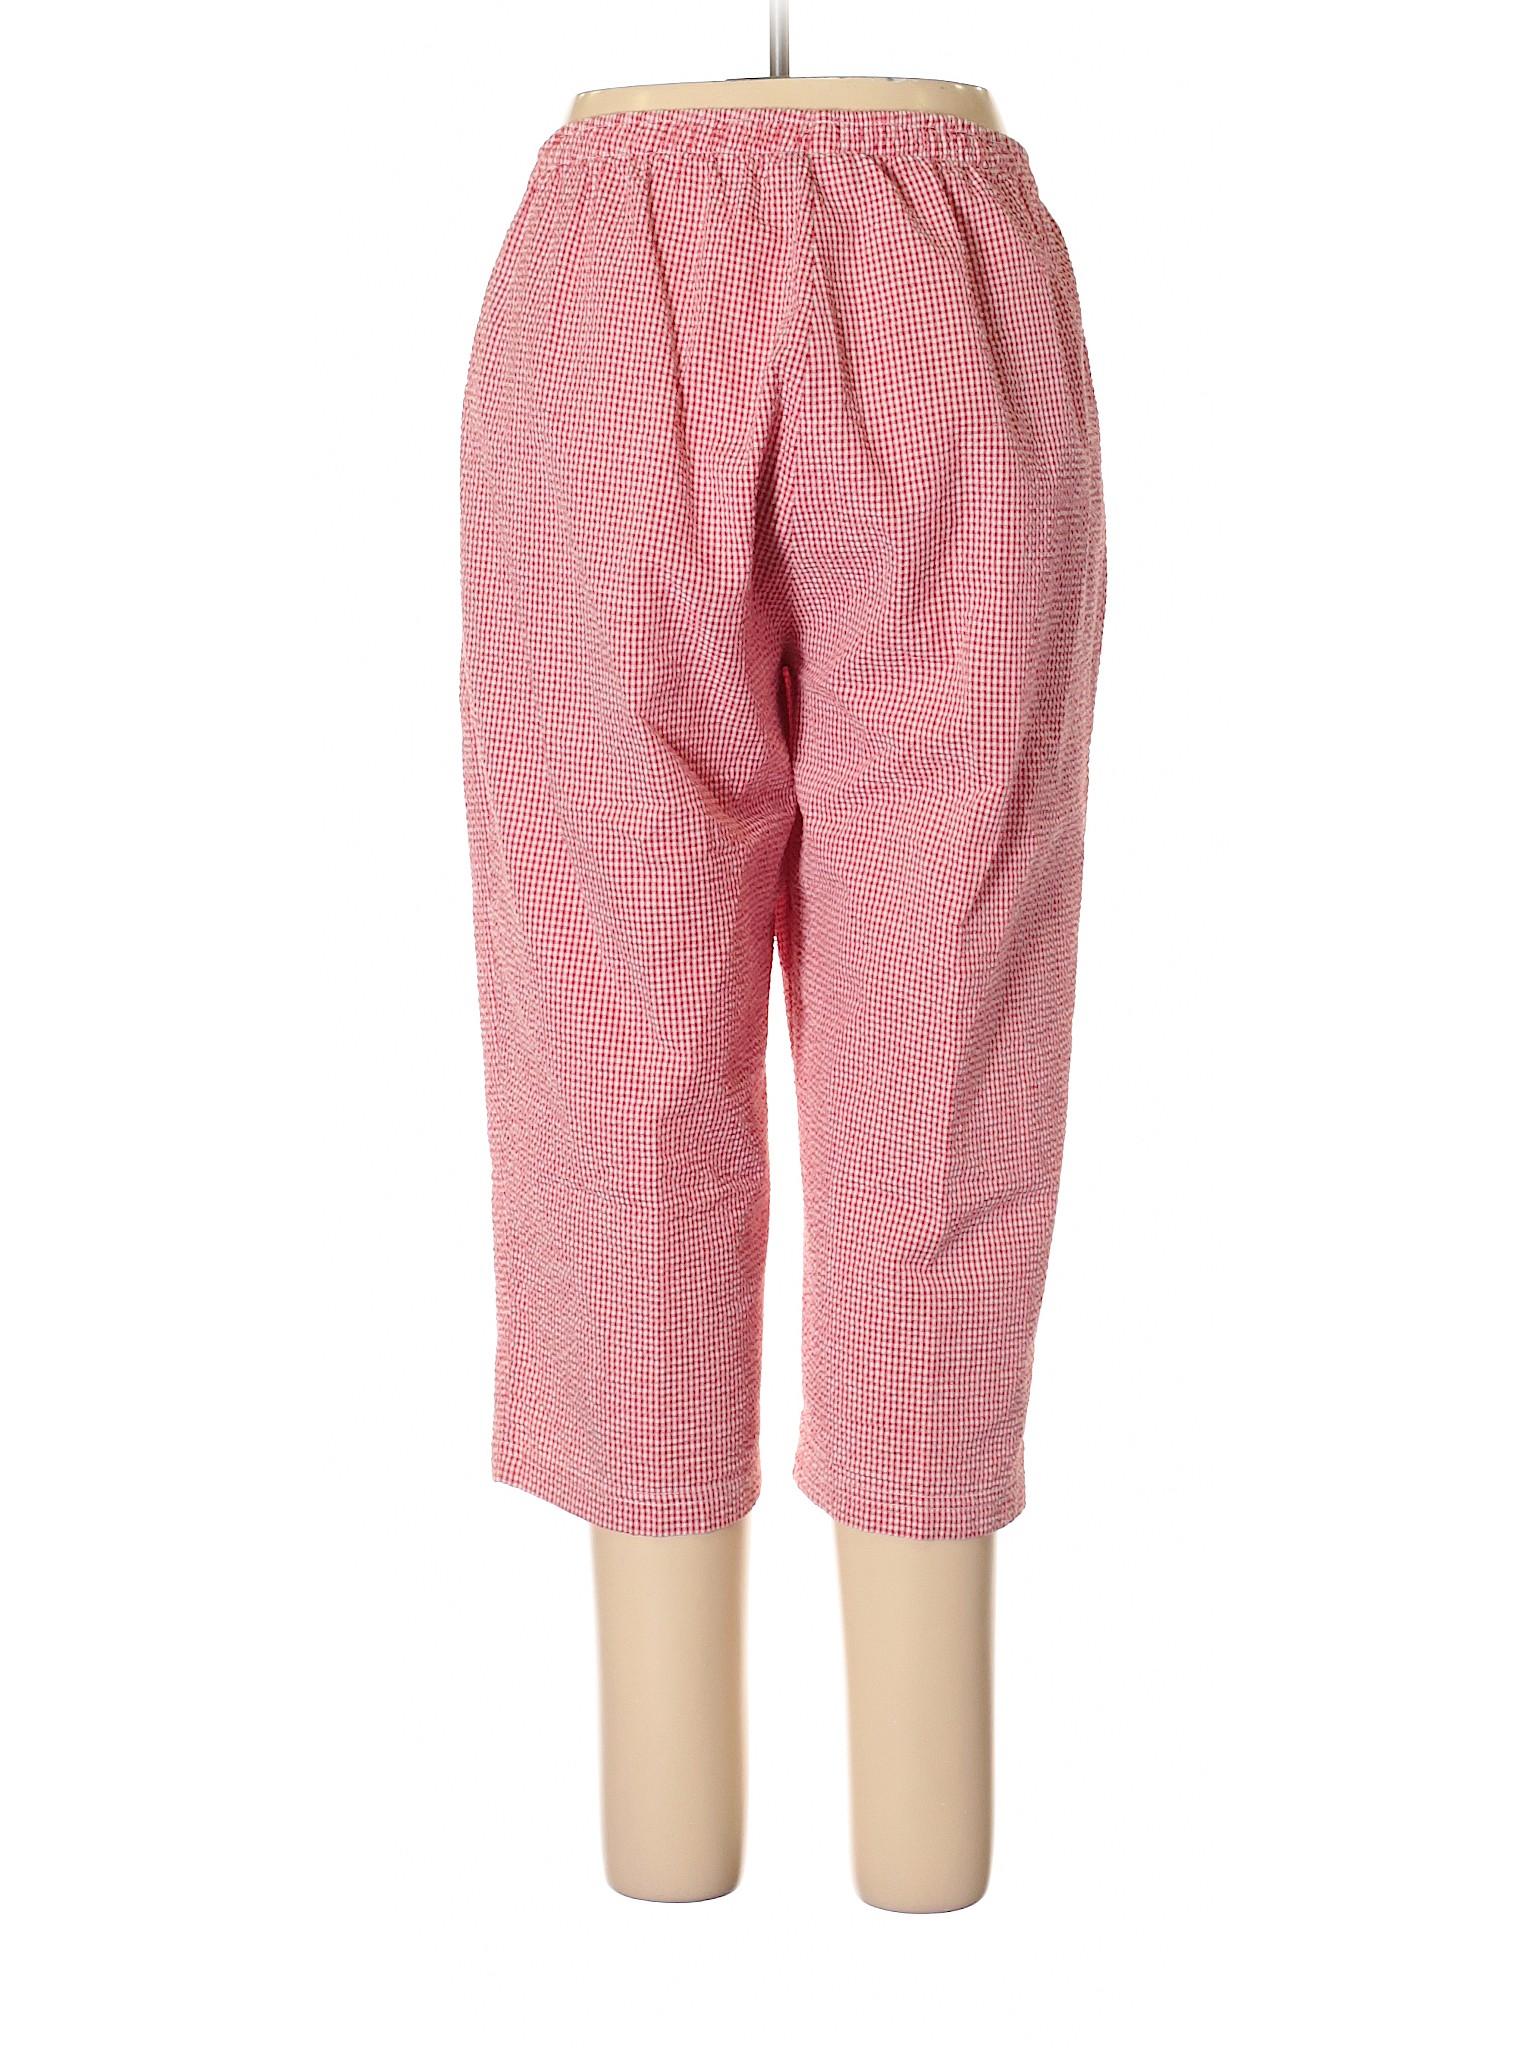 Casual Leisure Pants Boutique Daniels Cathy wtTAdqd